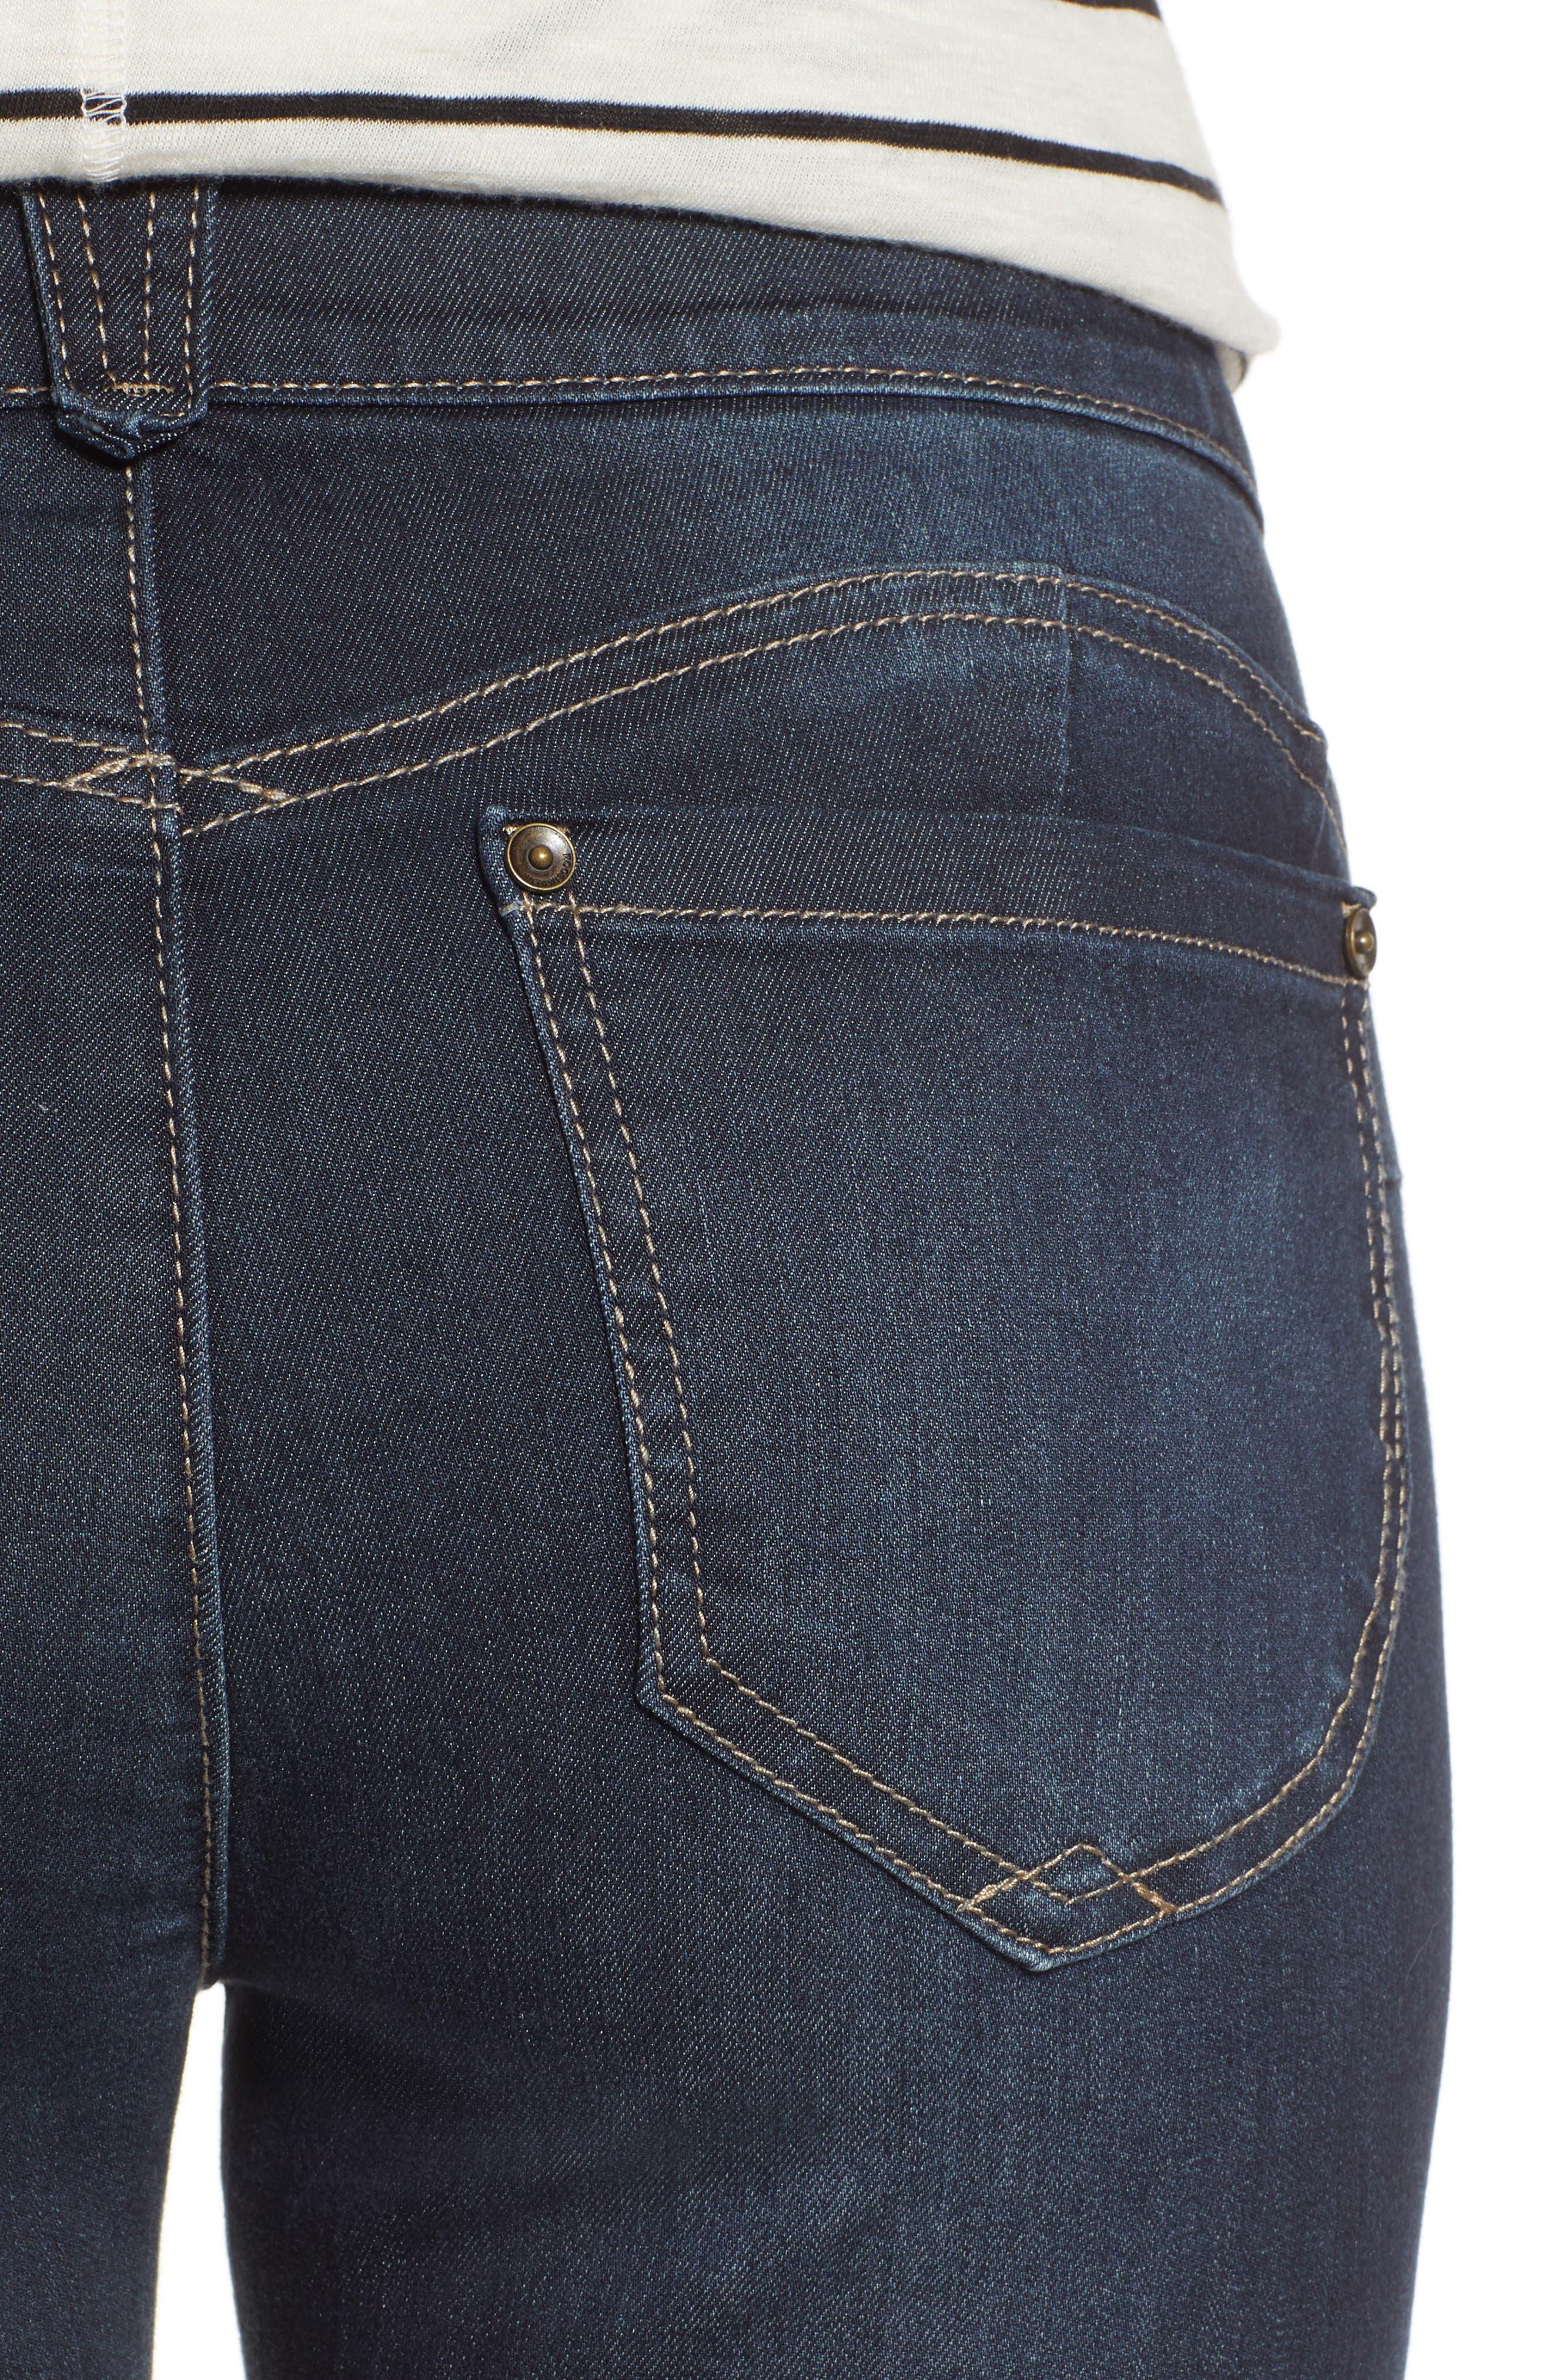 Ab-Solution Ankle Skimmer Jeans,                             Alternate thumbnail 4, color,                             INDIGO